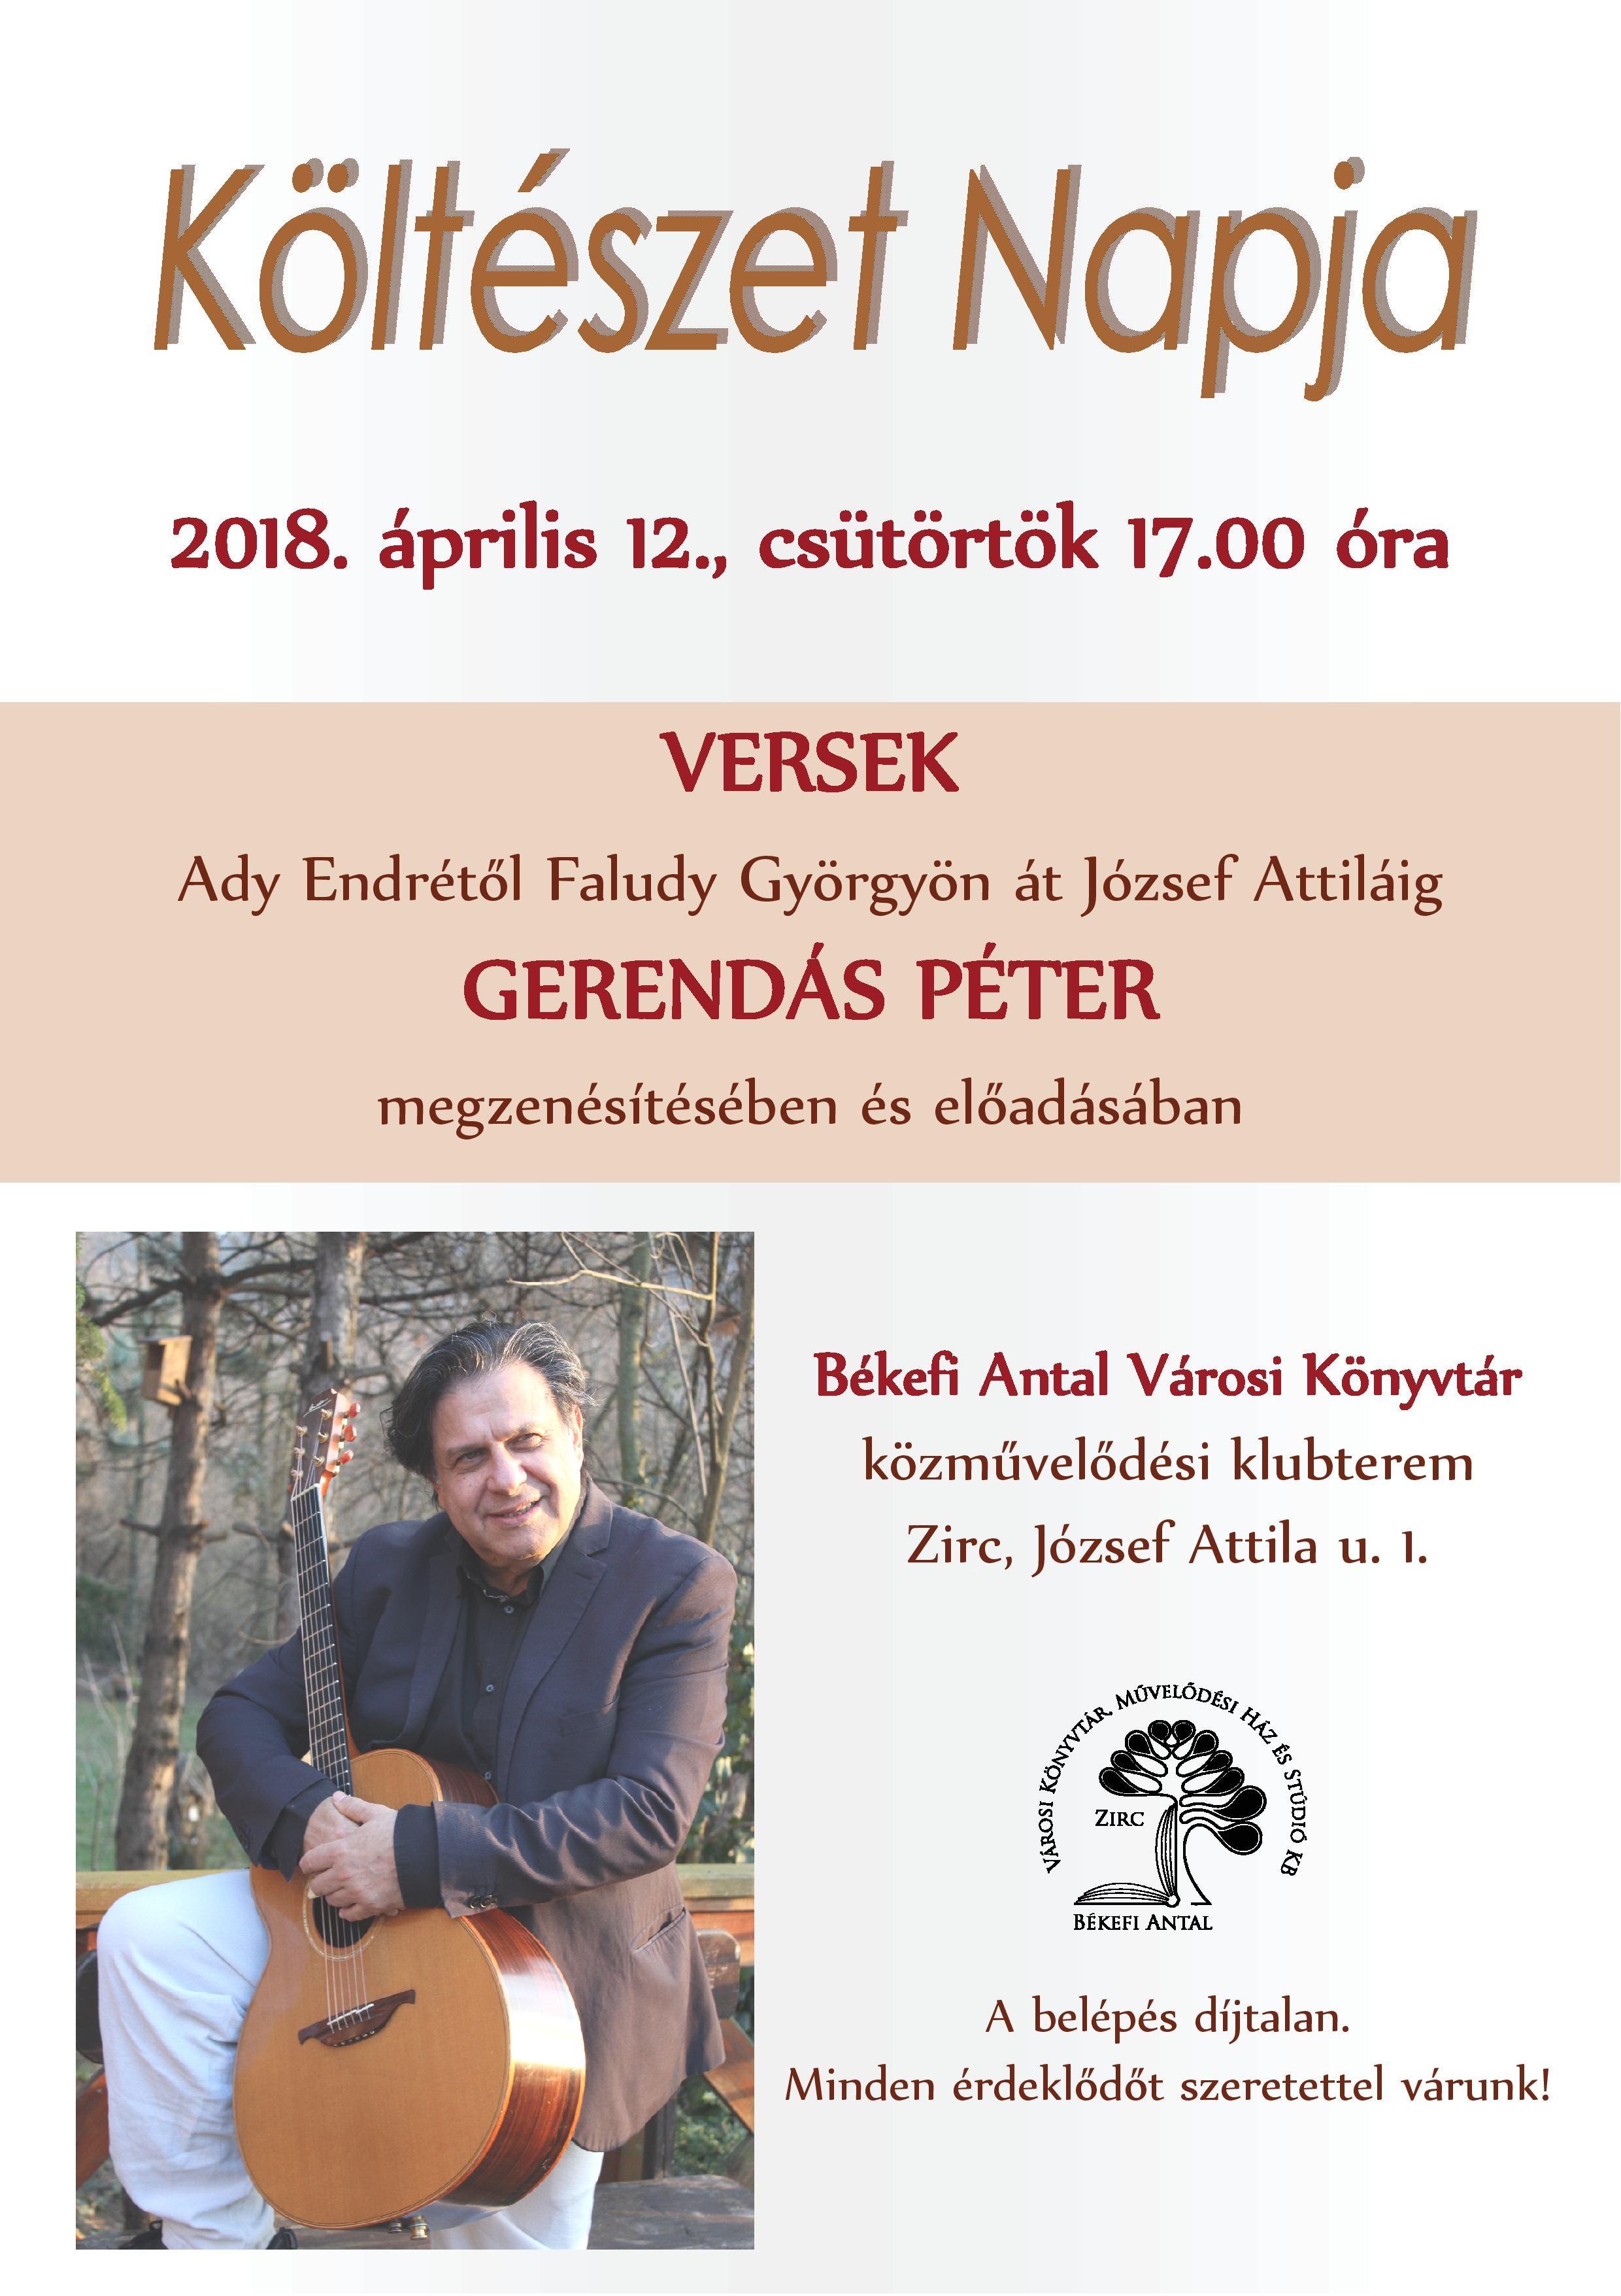 2018-04-12_kolteszet_napja_gerendas_peter-page-001.jpg